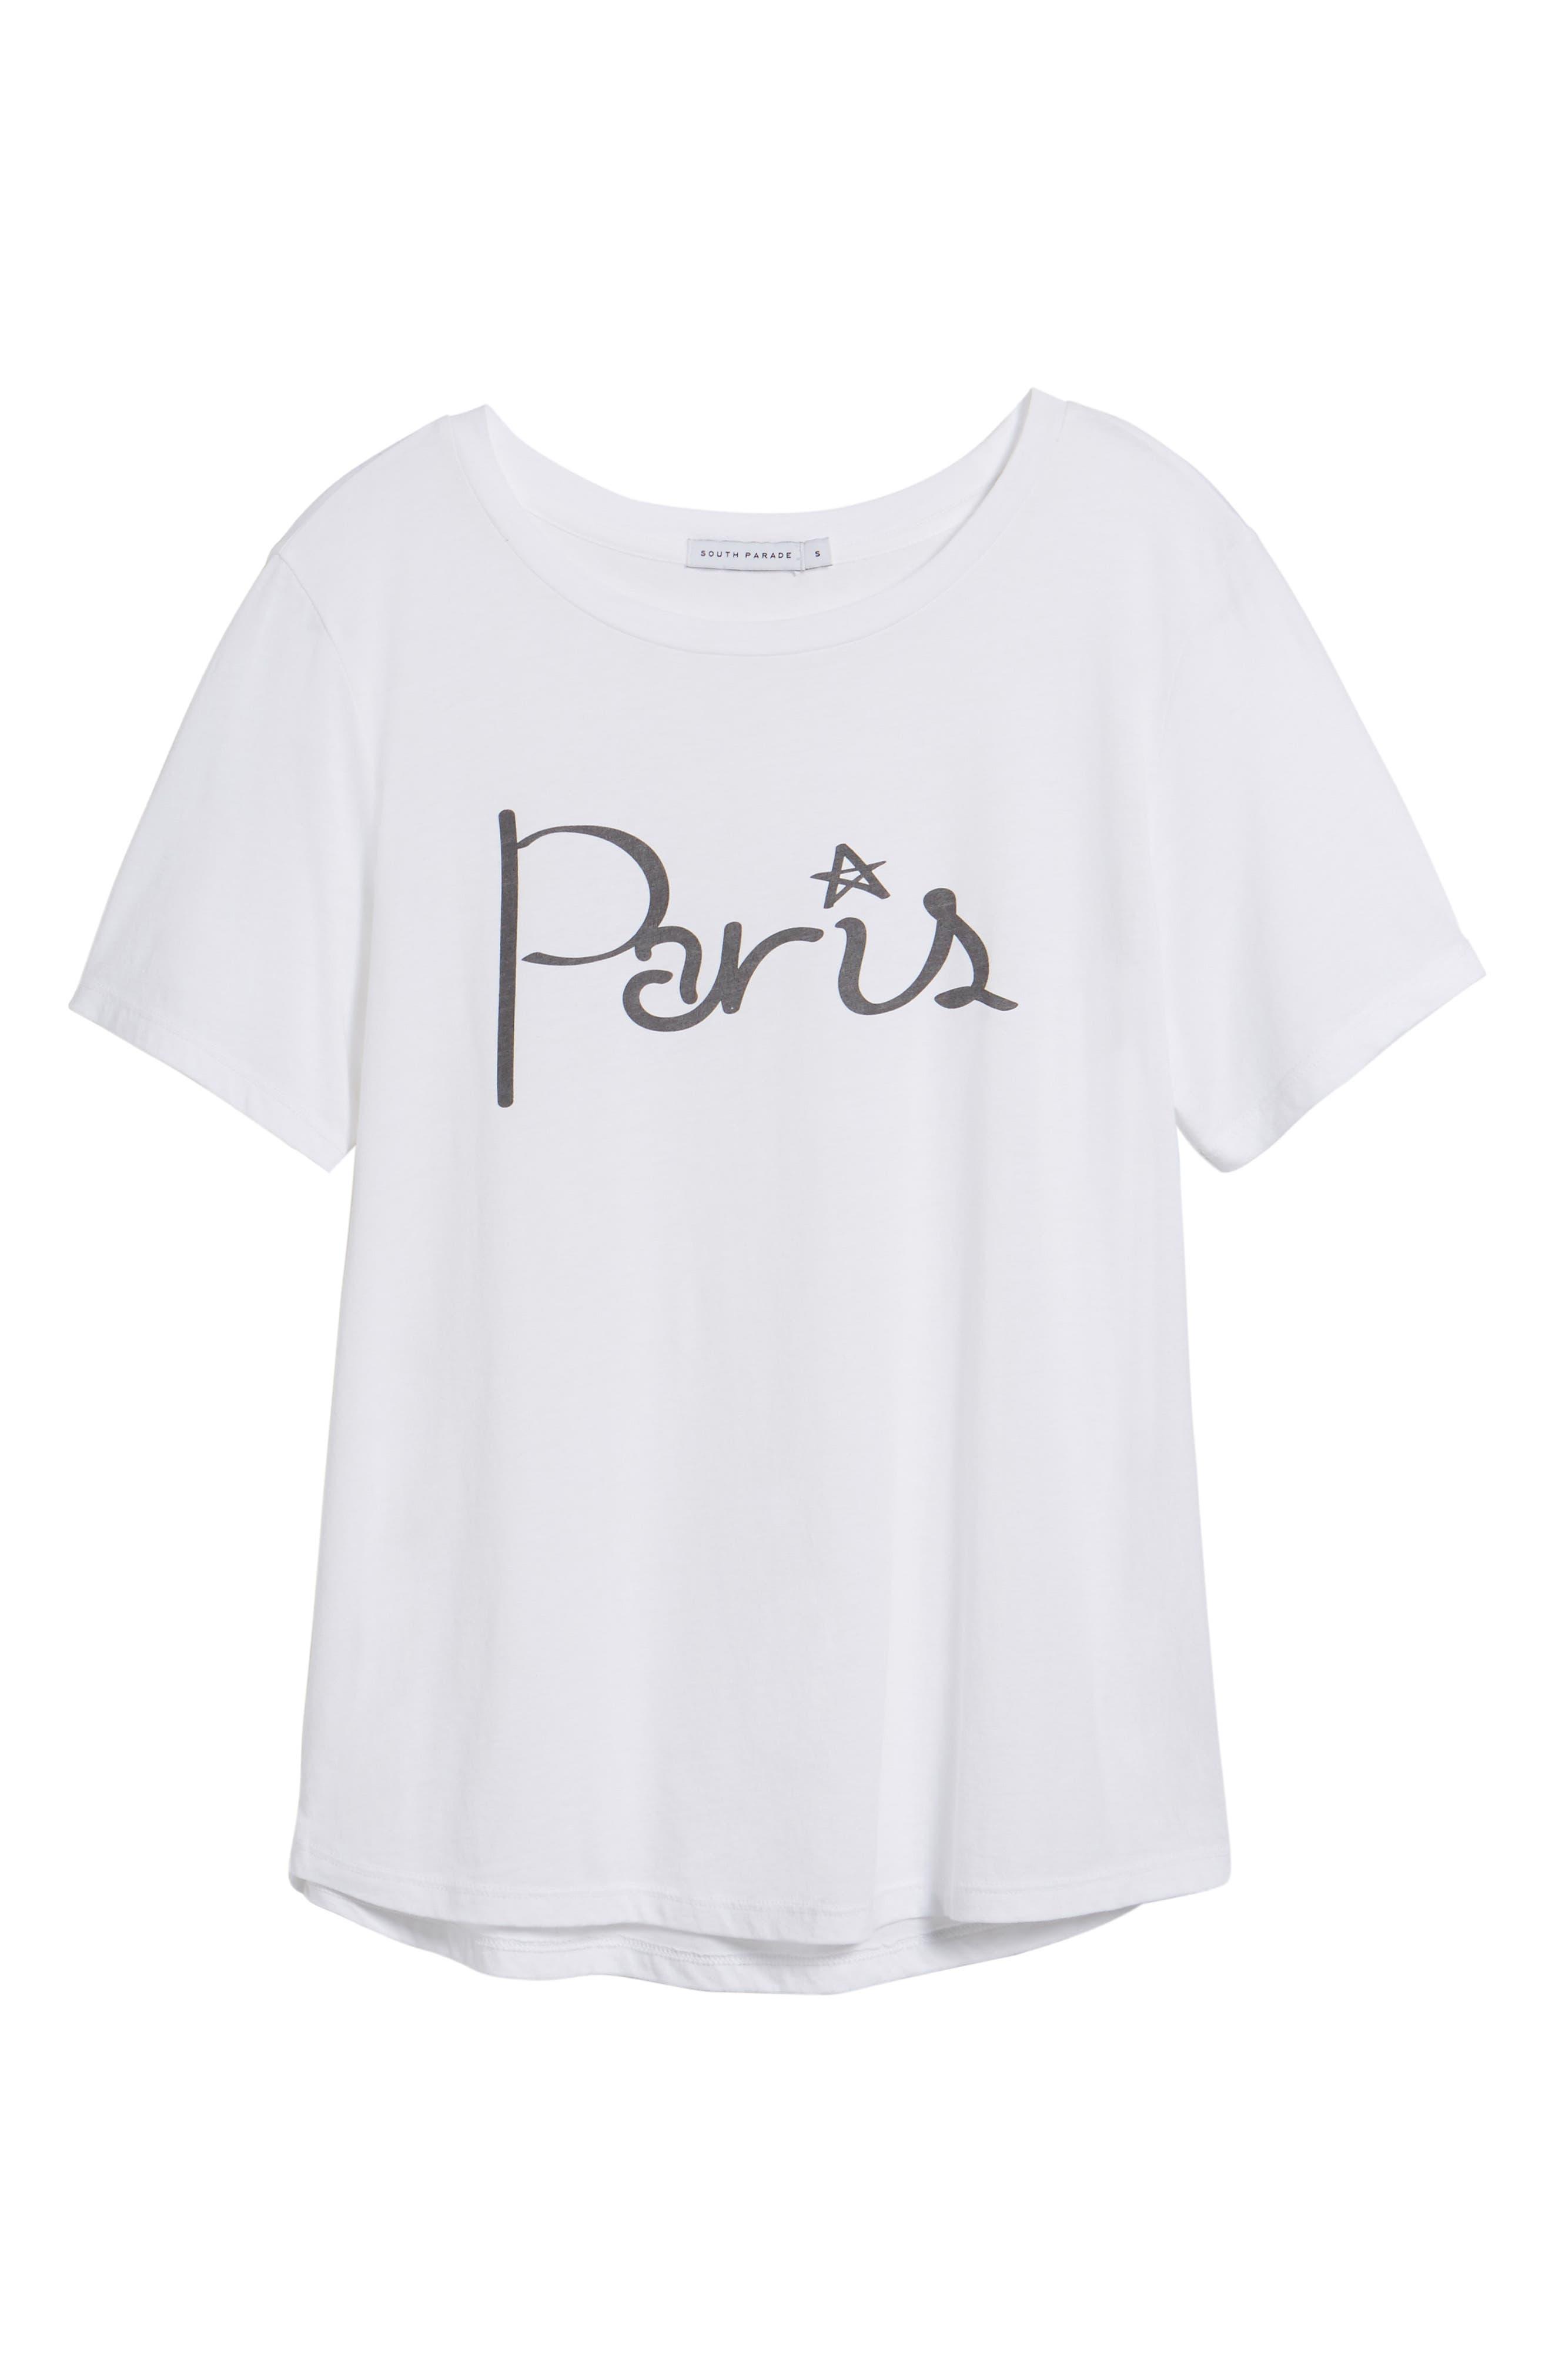 Paris Tee,                             Alternate thumbnail 6, color,                             White